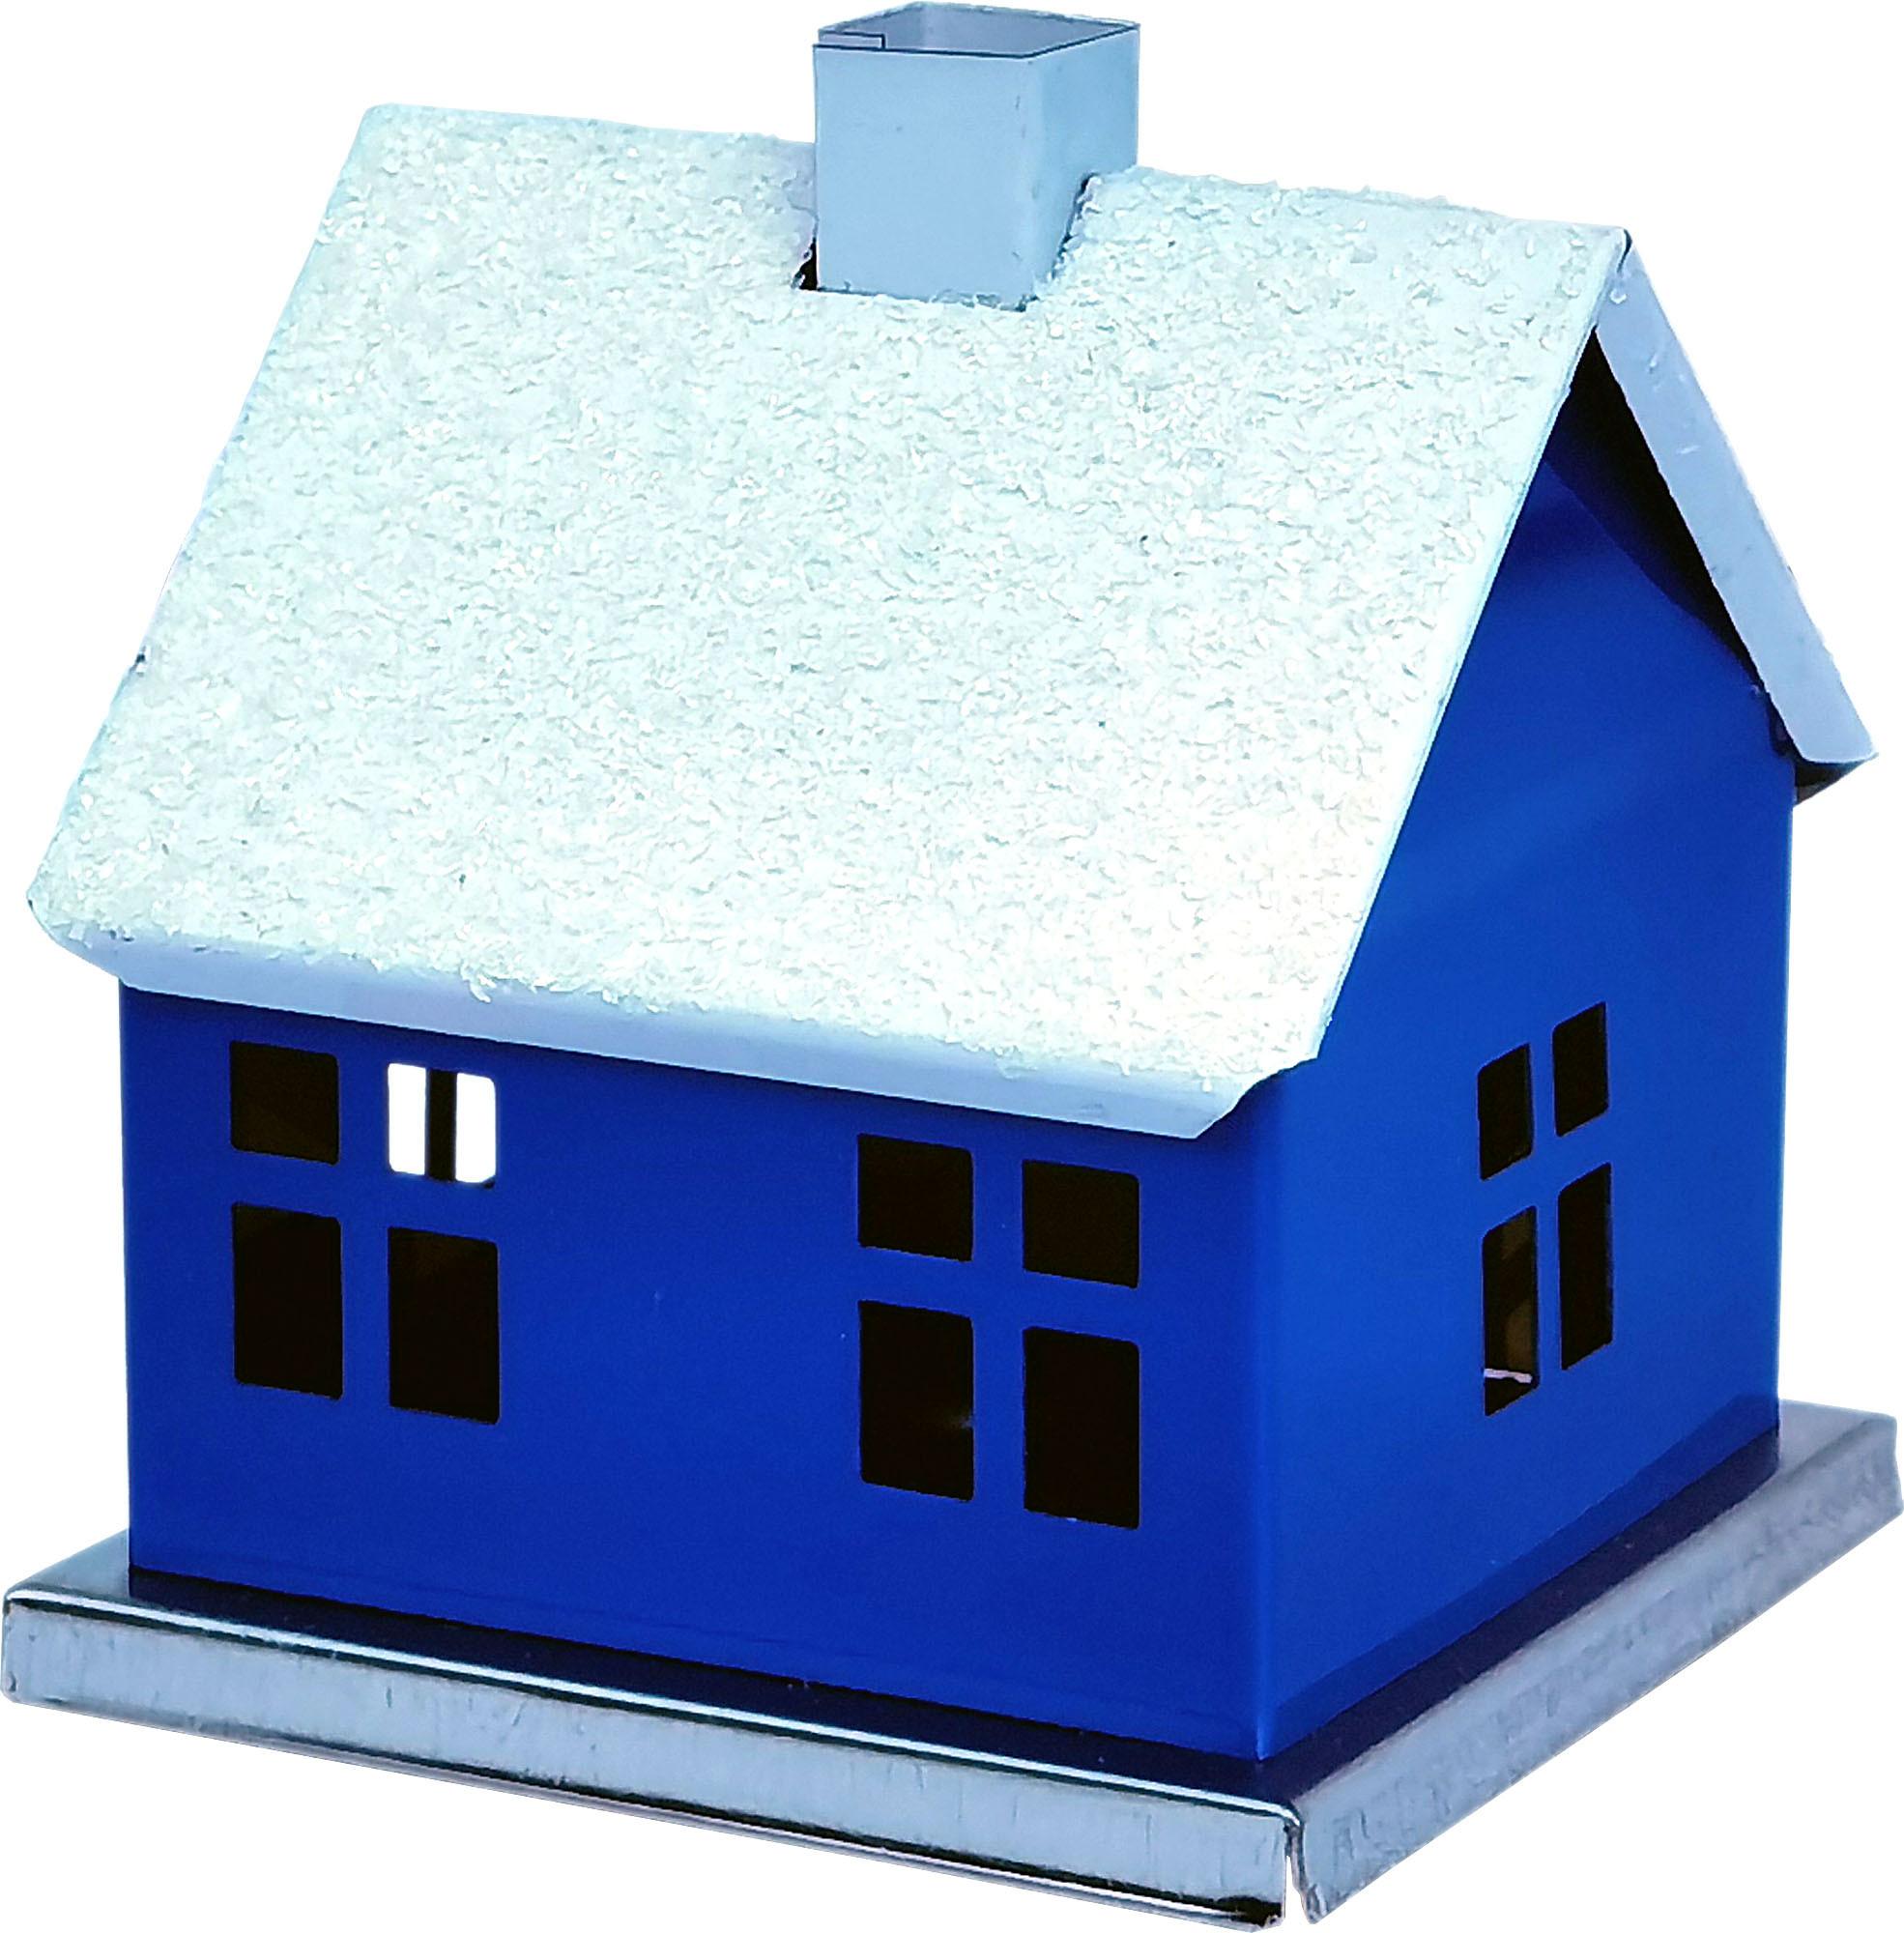 KNOX Räucherhaus, unifarben - blau